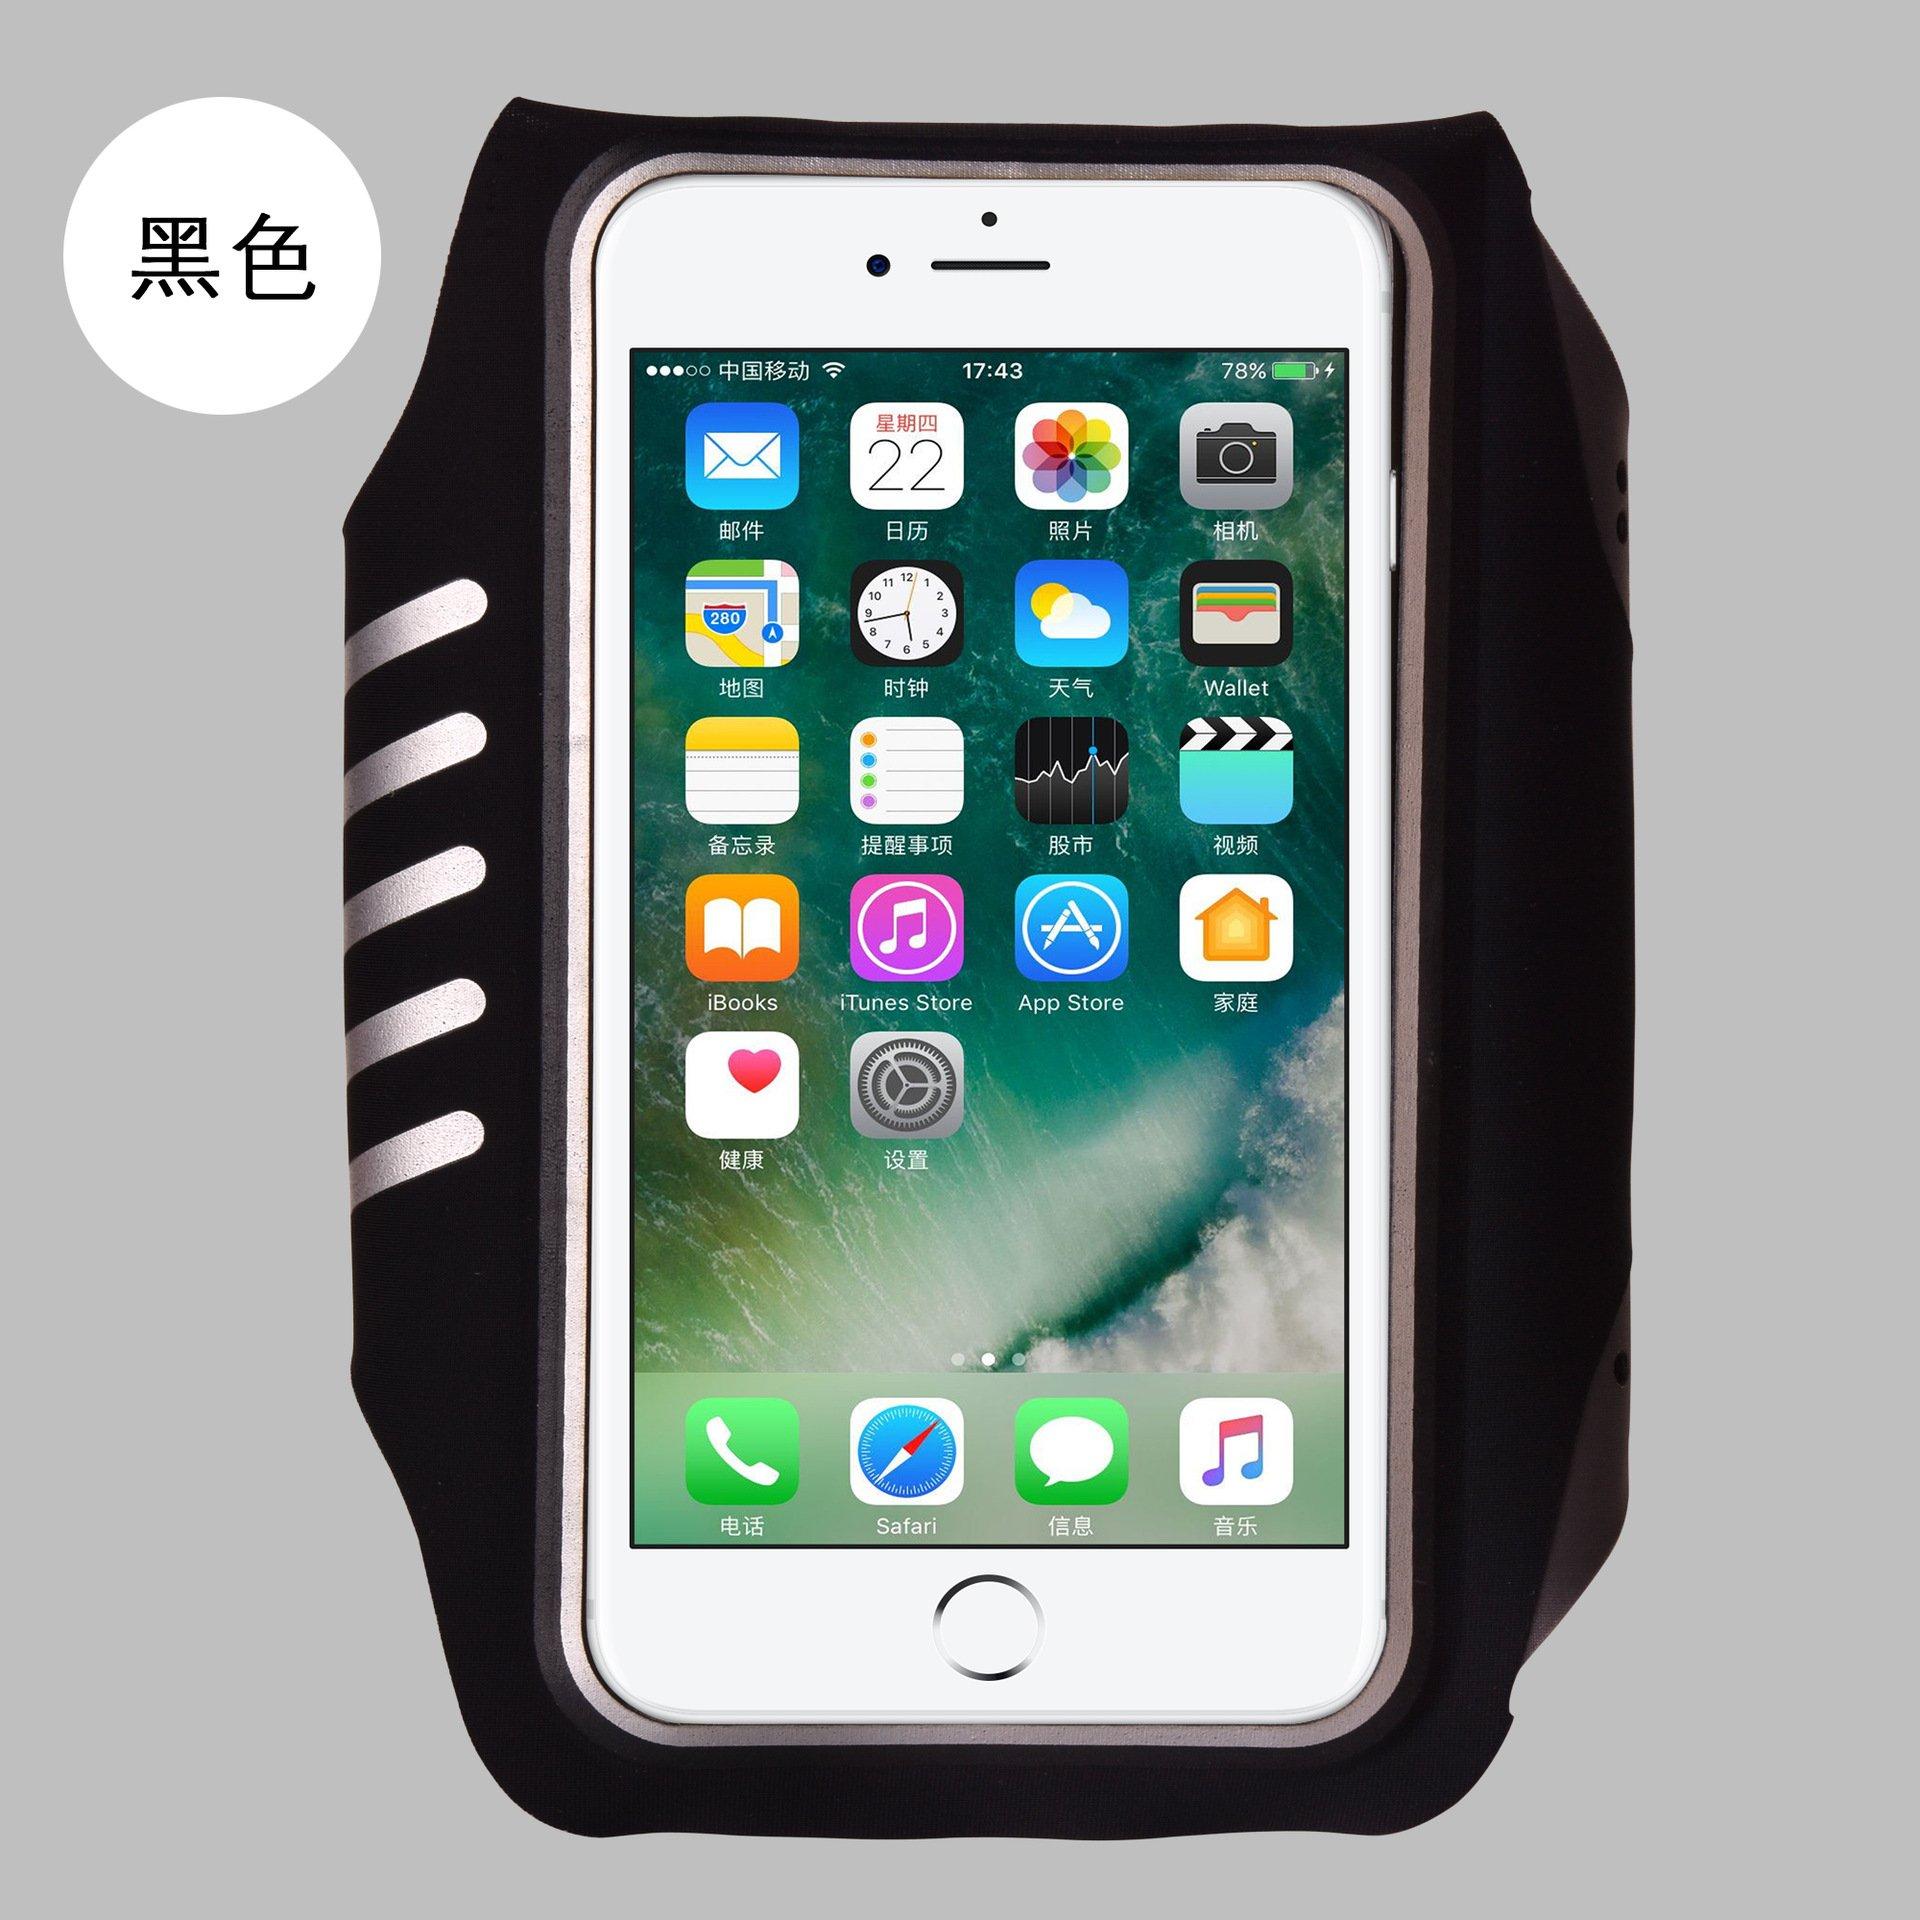 Yeetech 易科达 超薄莱卡 户外运动臂包 防滑按摩 跑步臂袋 户外运动装备 iPhoneX运动臂带 苹果X/8/7/6臂带 (大号, 黑色)